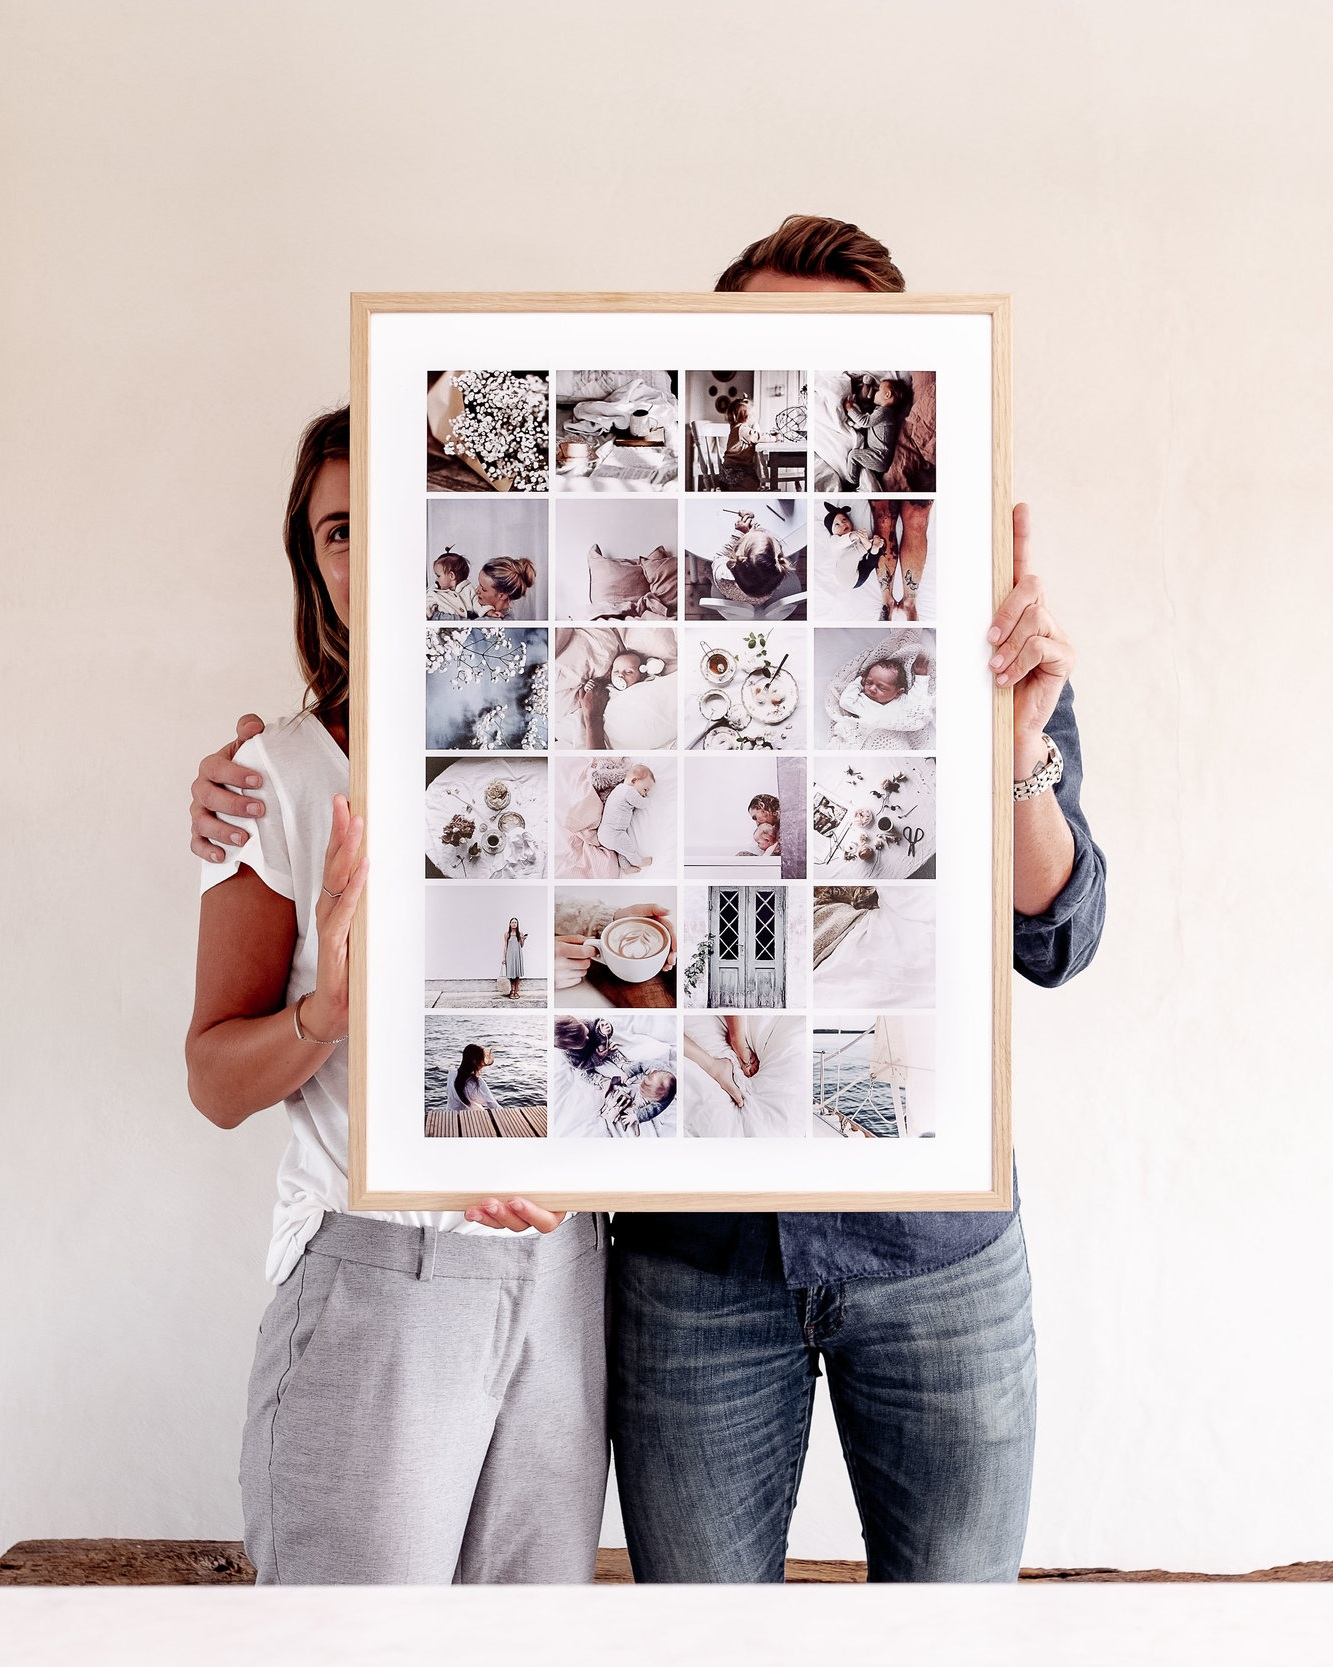 framkalla-poster-design-foto-bilder-kollage